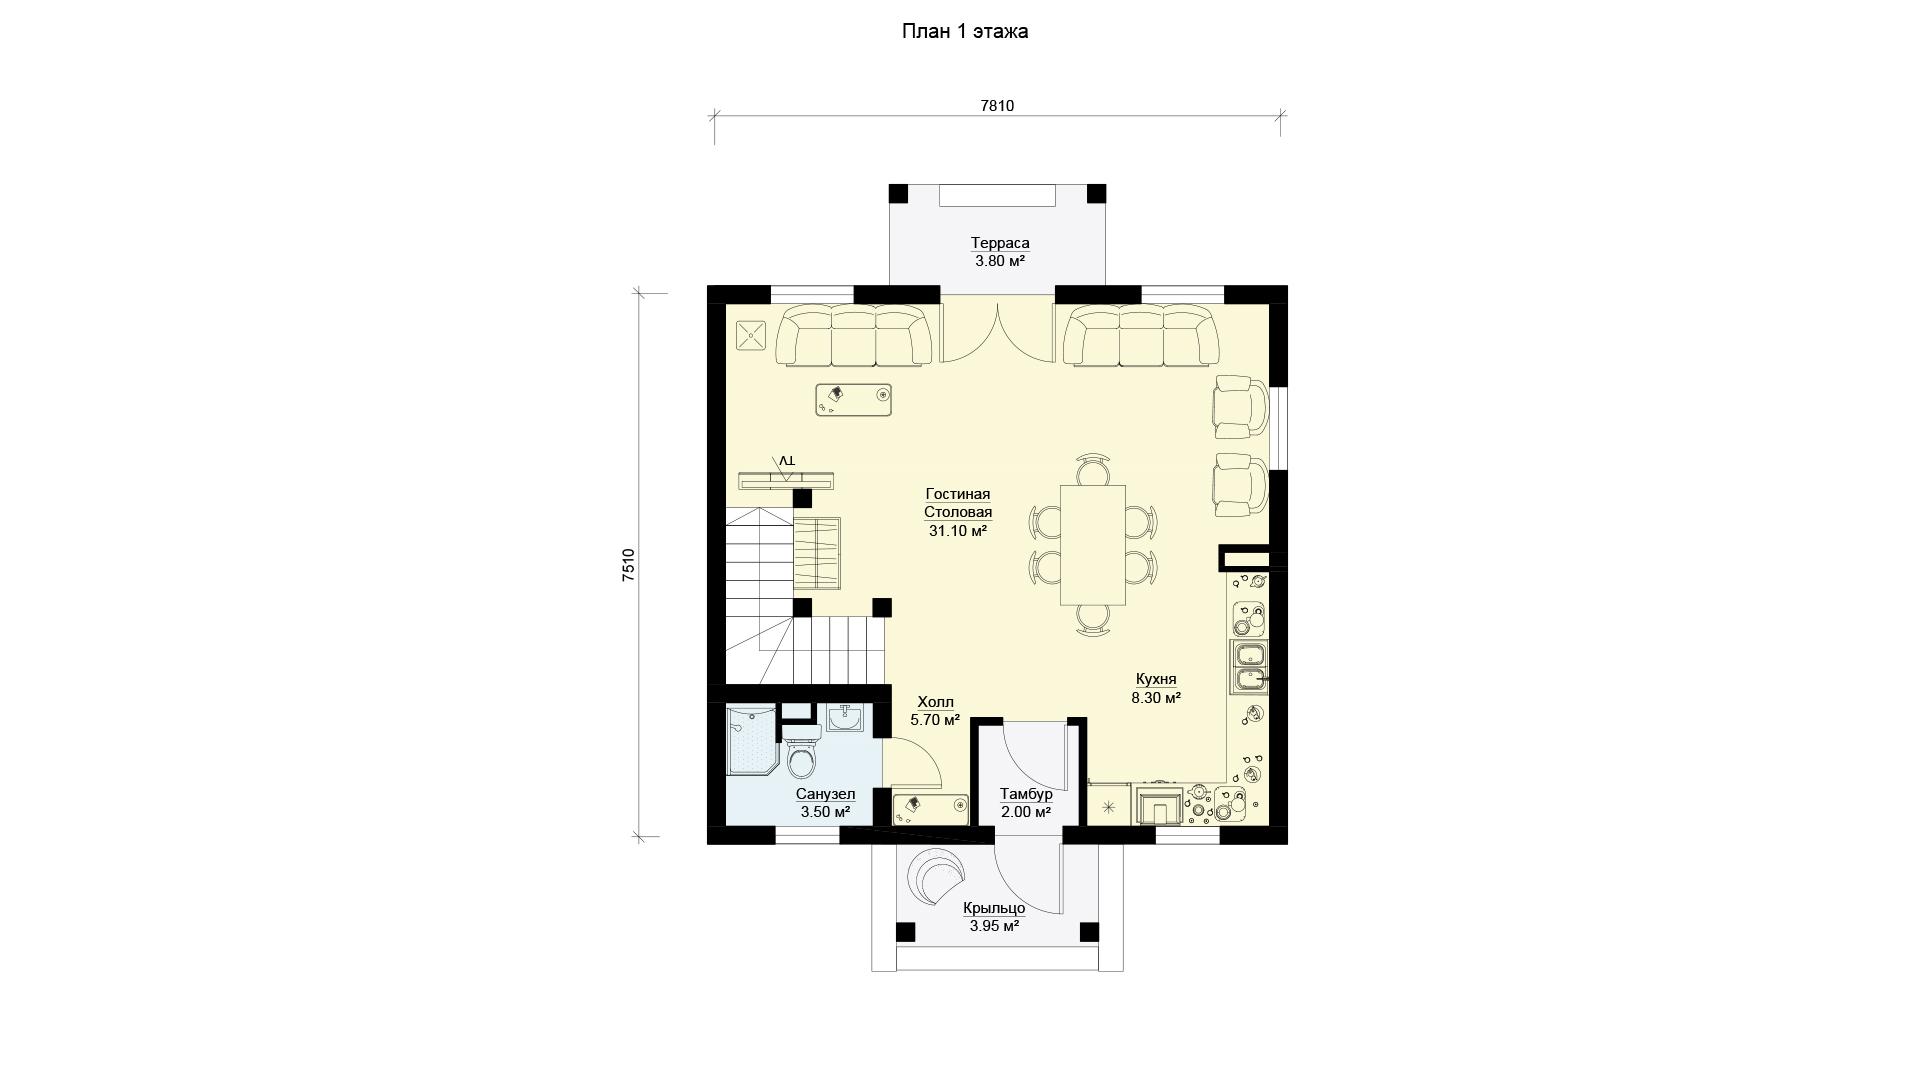 План первого этажа дома 8 на 8 двухэтажного, проект БЭНПАН МС-108.